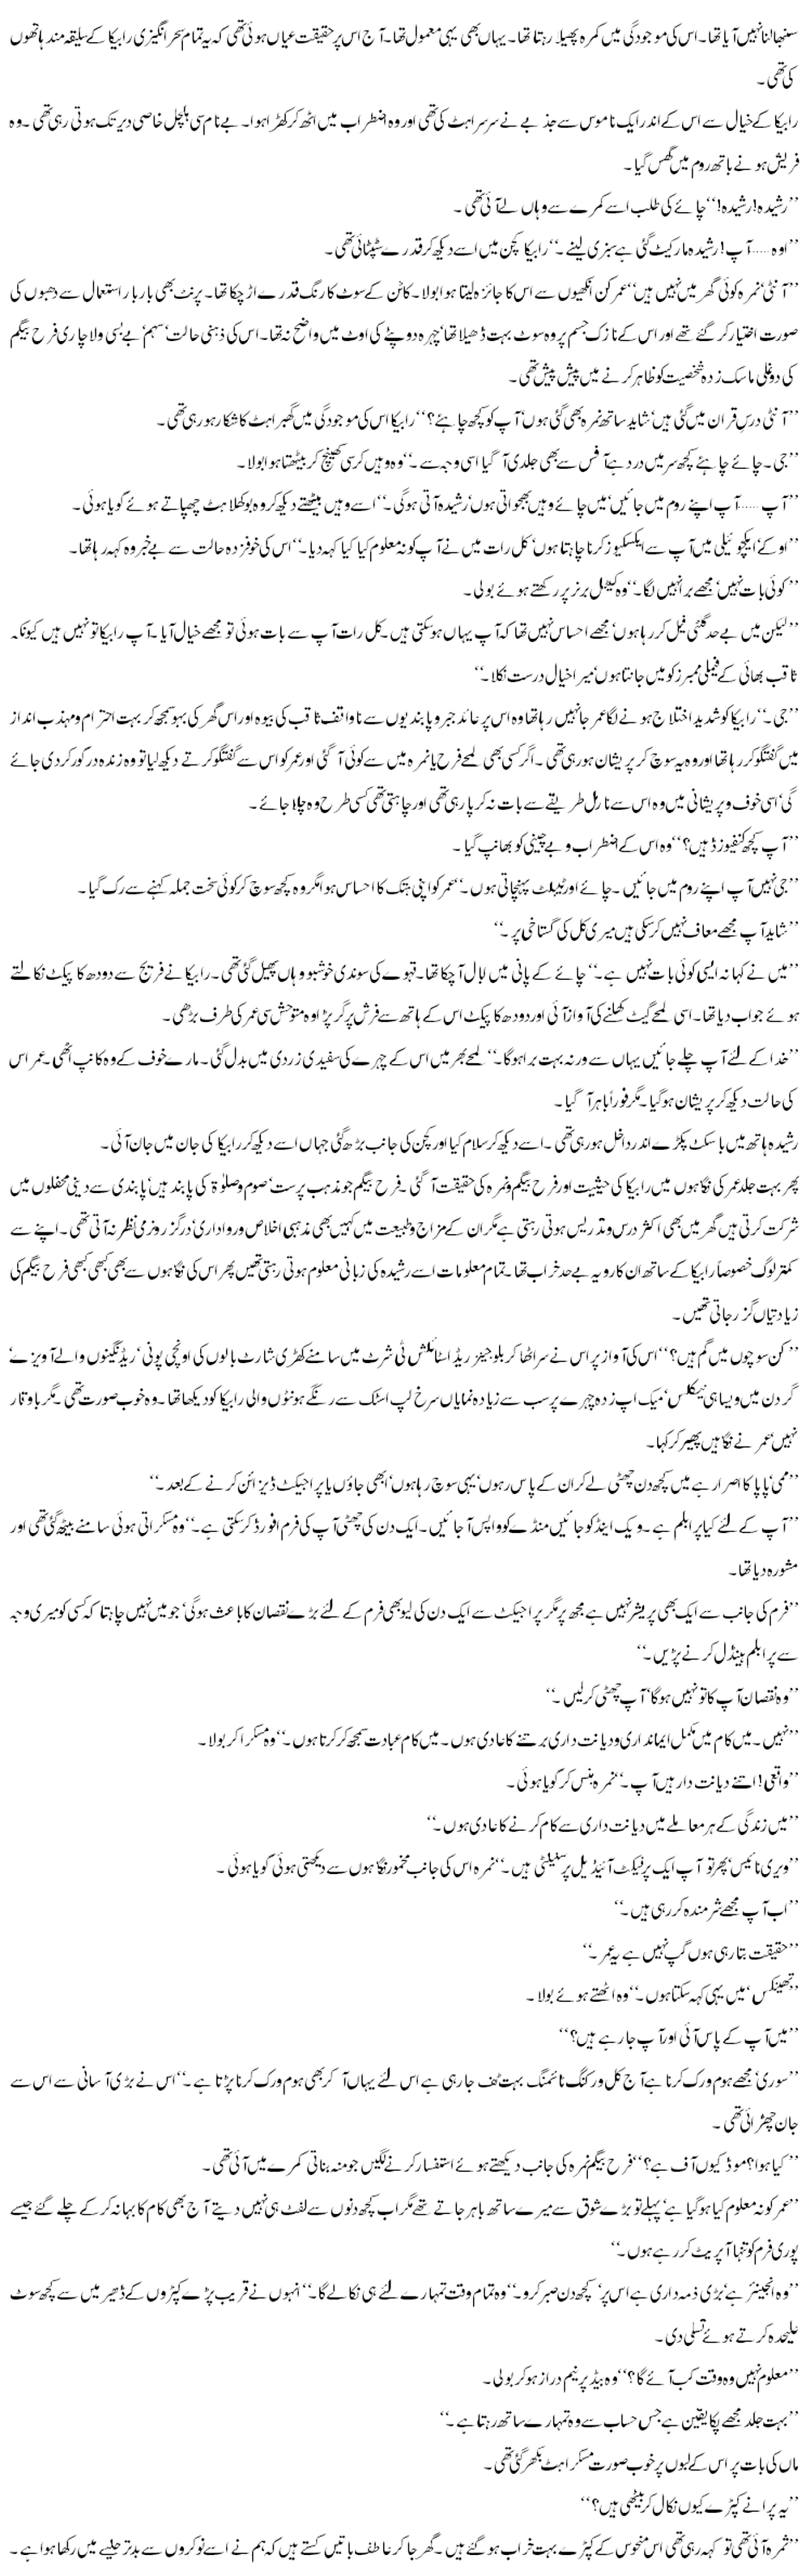 Gulabi Rut Surkh Phoolon Ki-Romantic Urdu Novels | Free Urdu